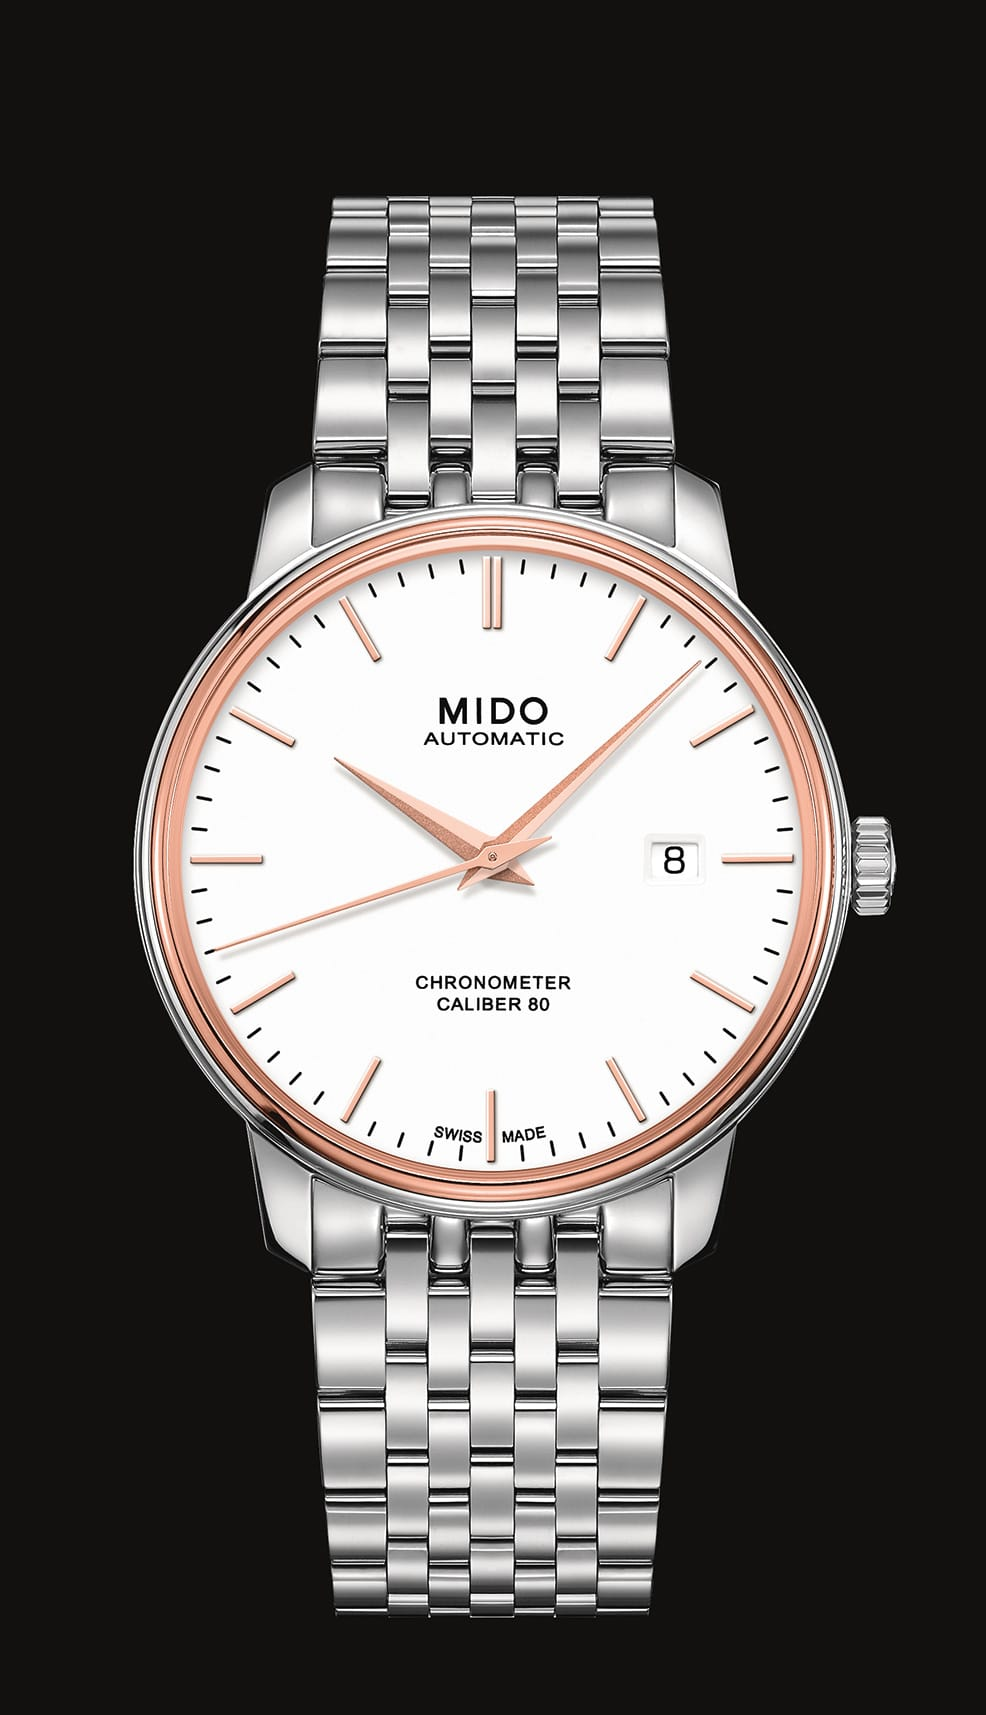 baselworld-2017-preview-mido-baroncelli-caliber-80-chronometer-si-einstieg-02